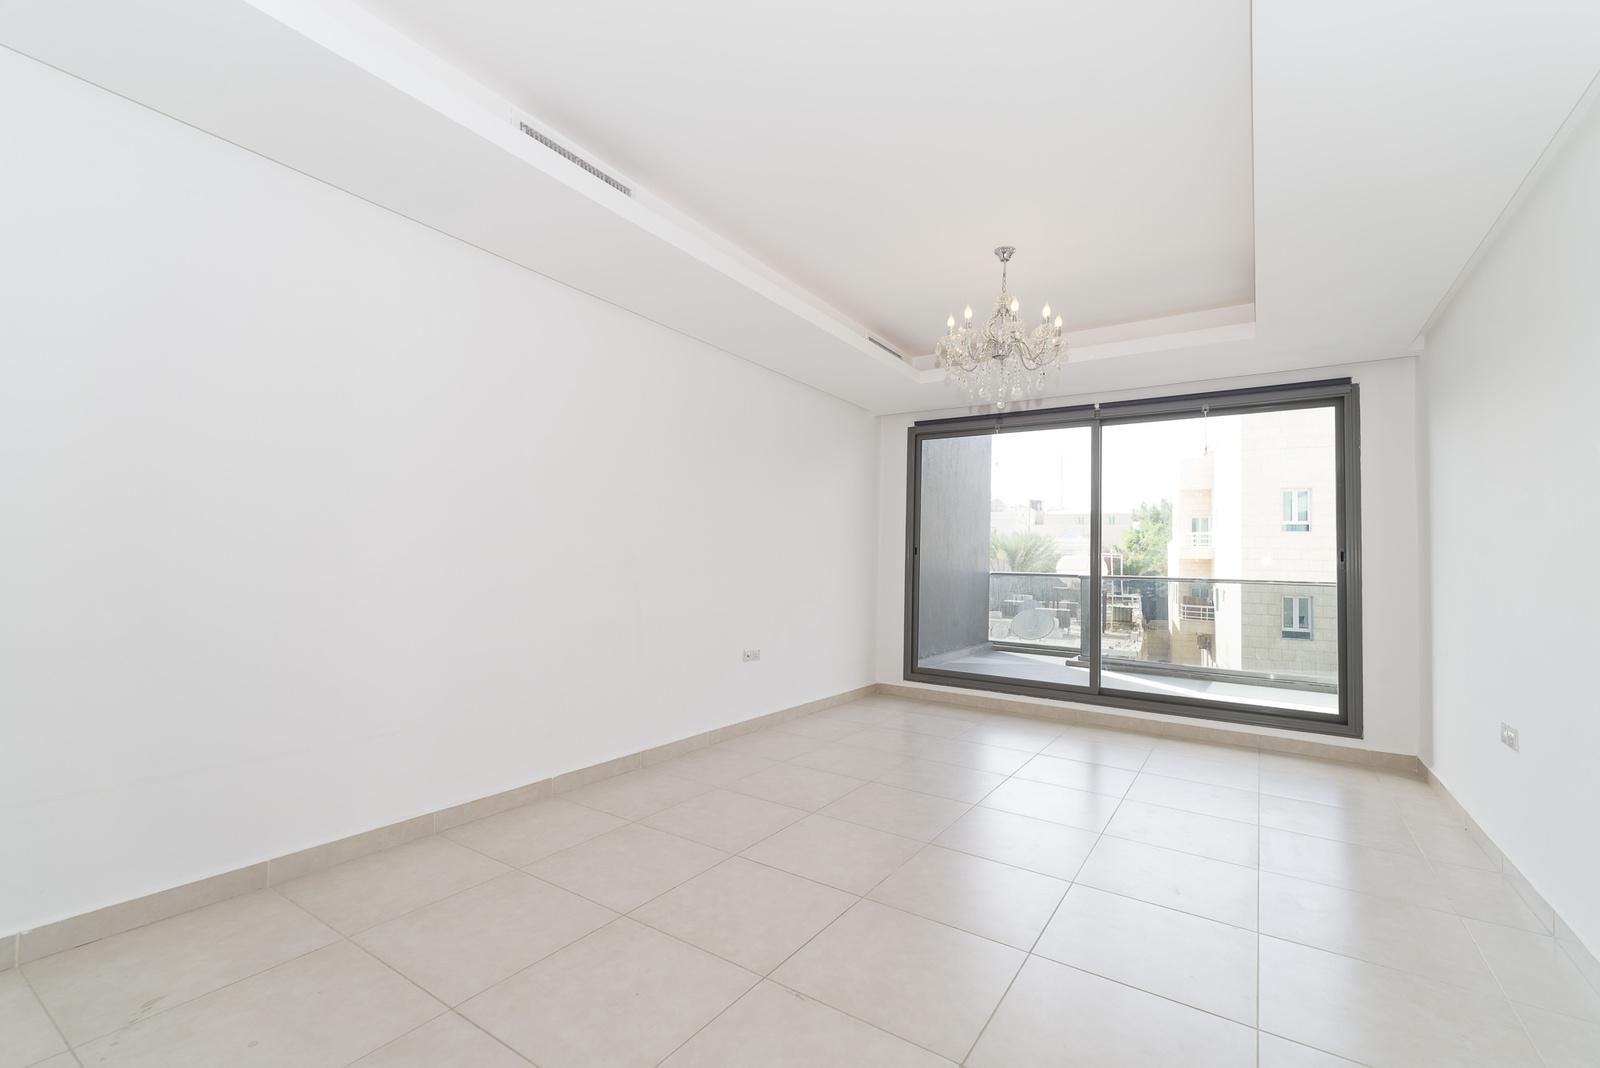 Salwa – unfurnished, three bedroom apartment w/balcony